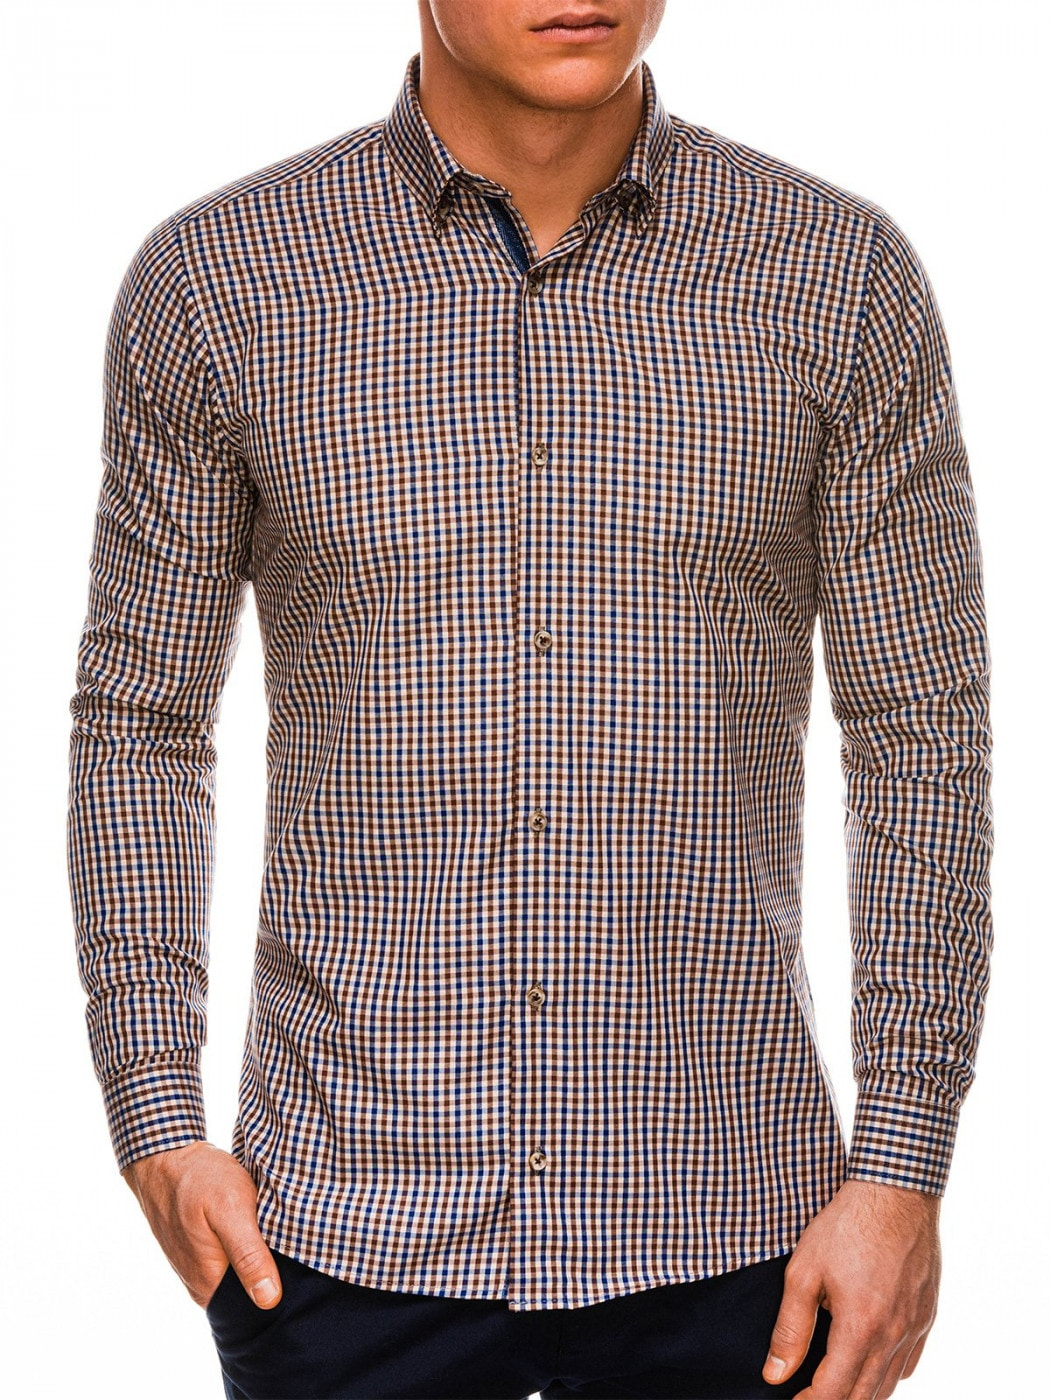 Men's shirt Ombre K534